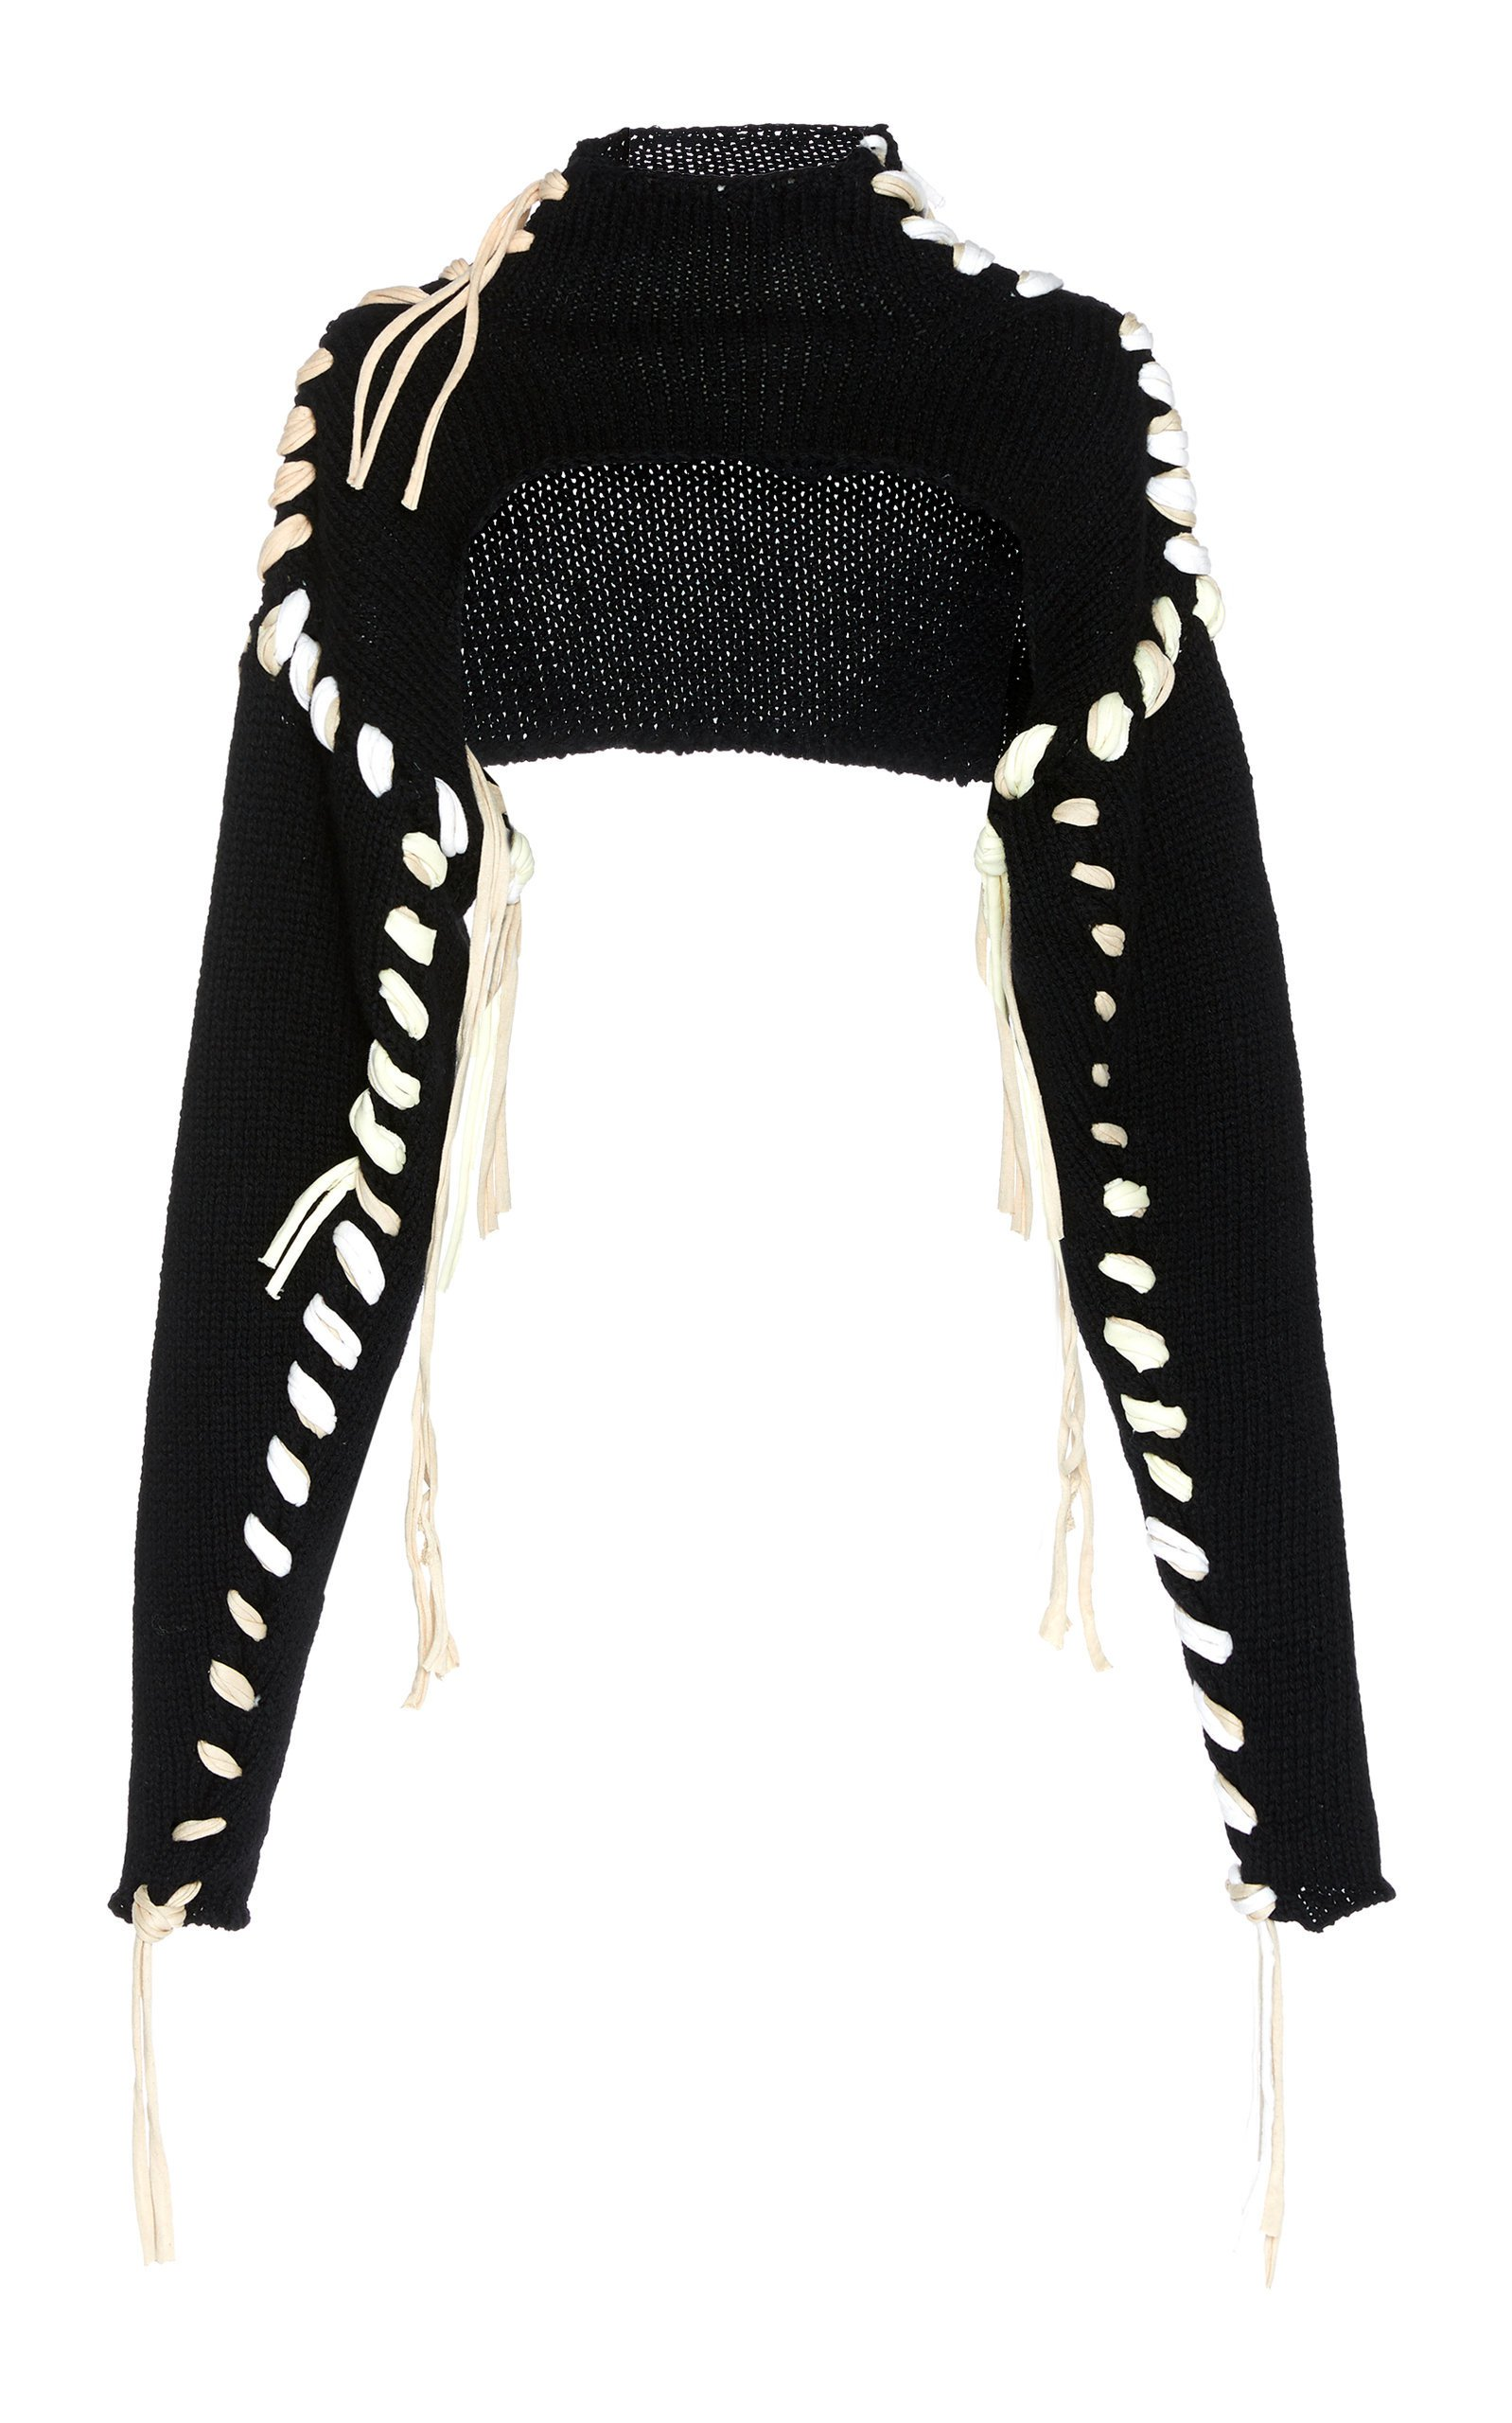 Kacee Lace-Up Wool Jumper by Acne Studios | Moda Operandi